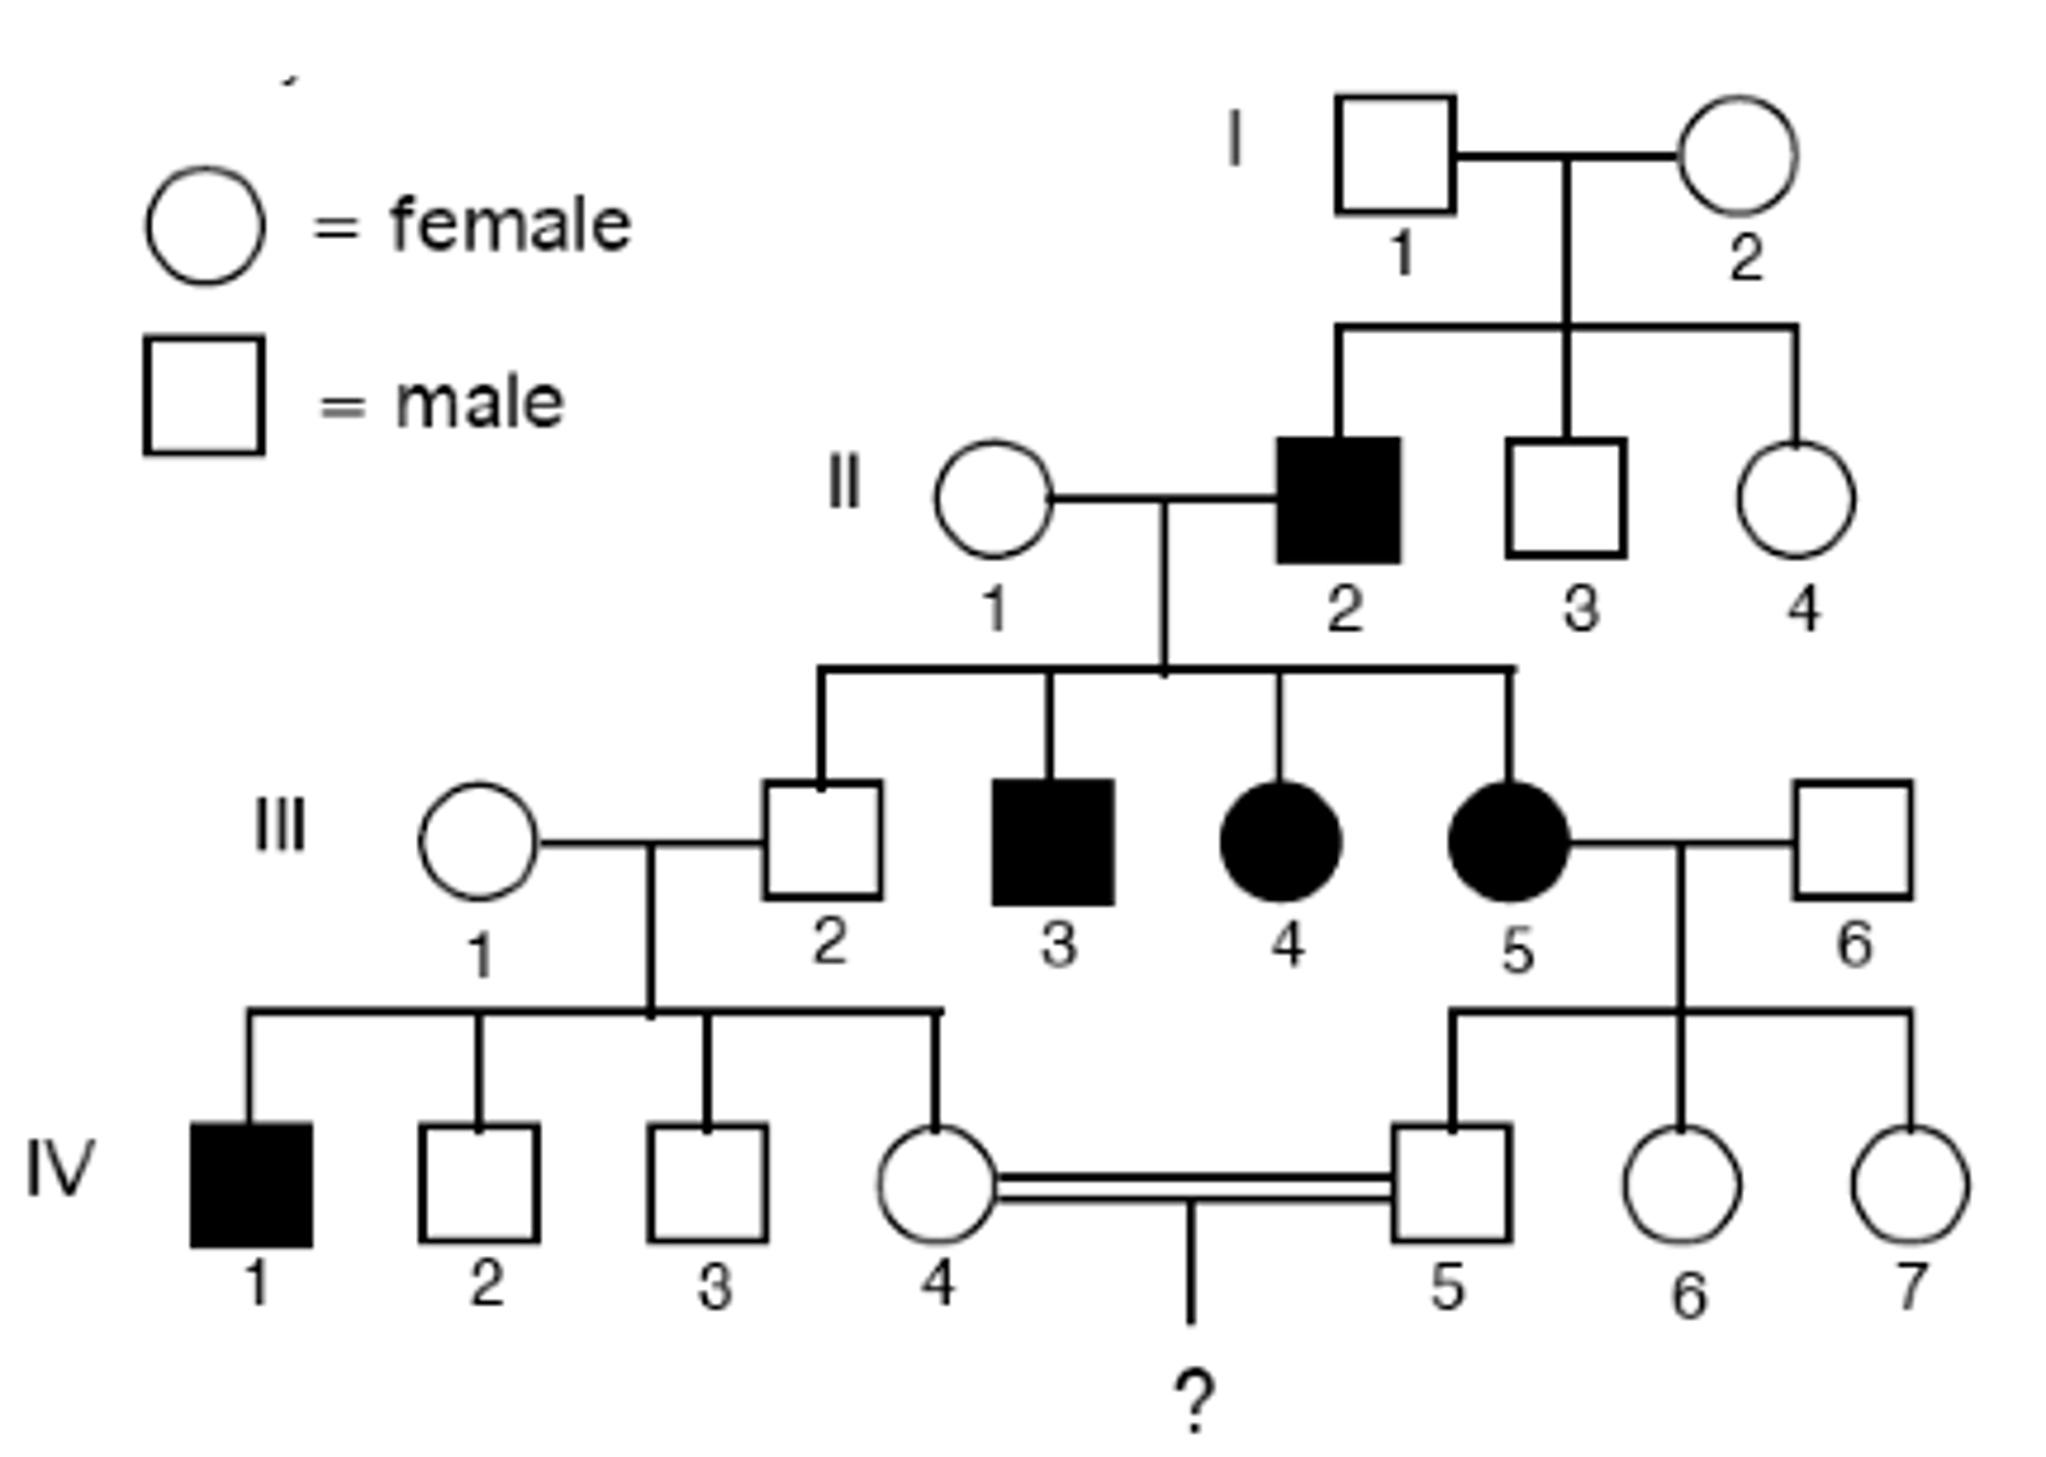 simple pedigree diagram 500 watt audio amplifier circuit solved for each below determine the most likely